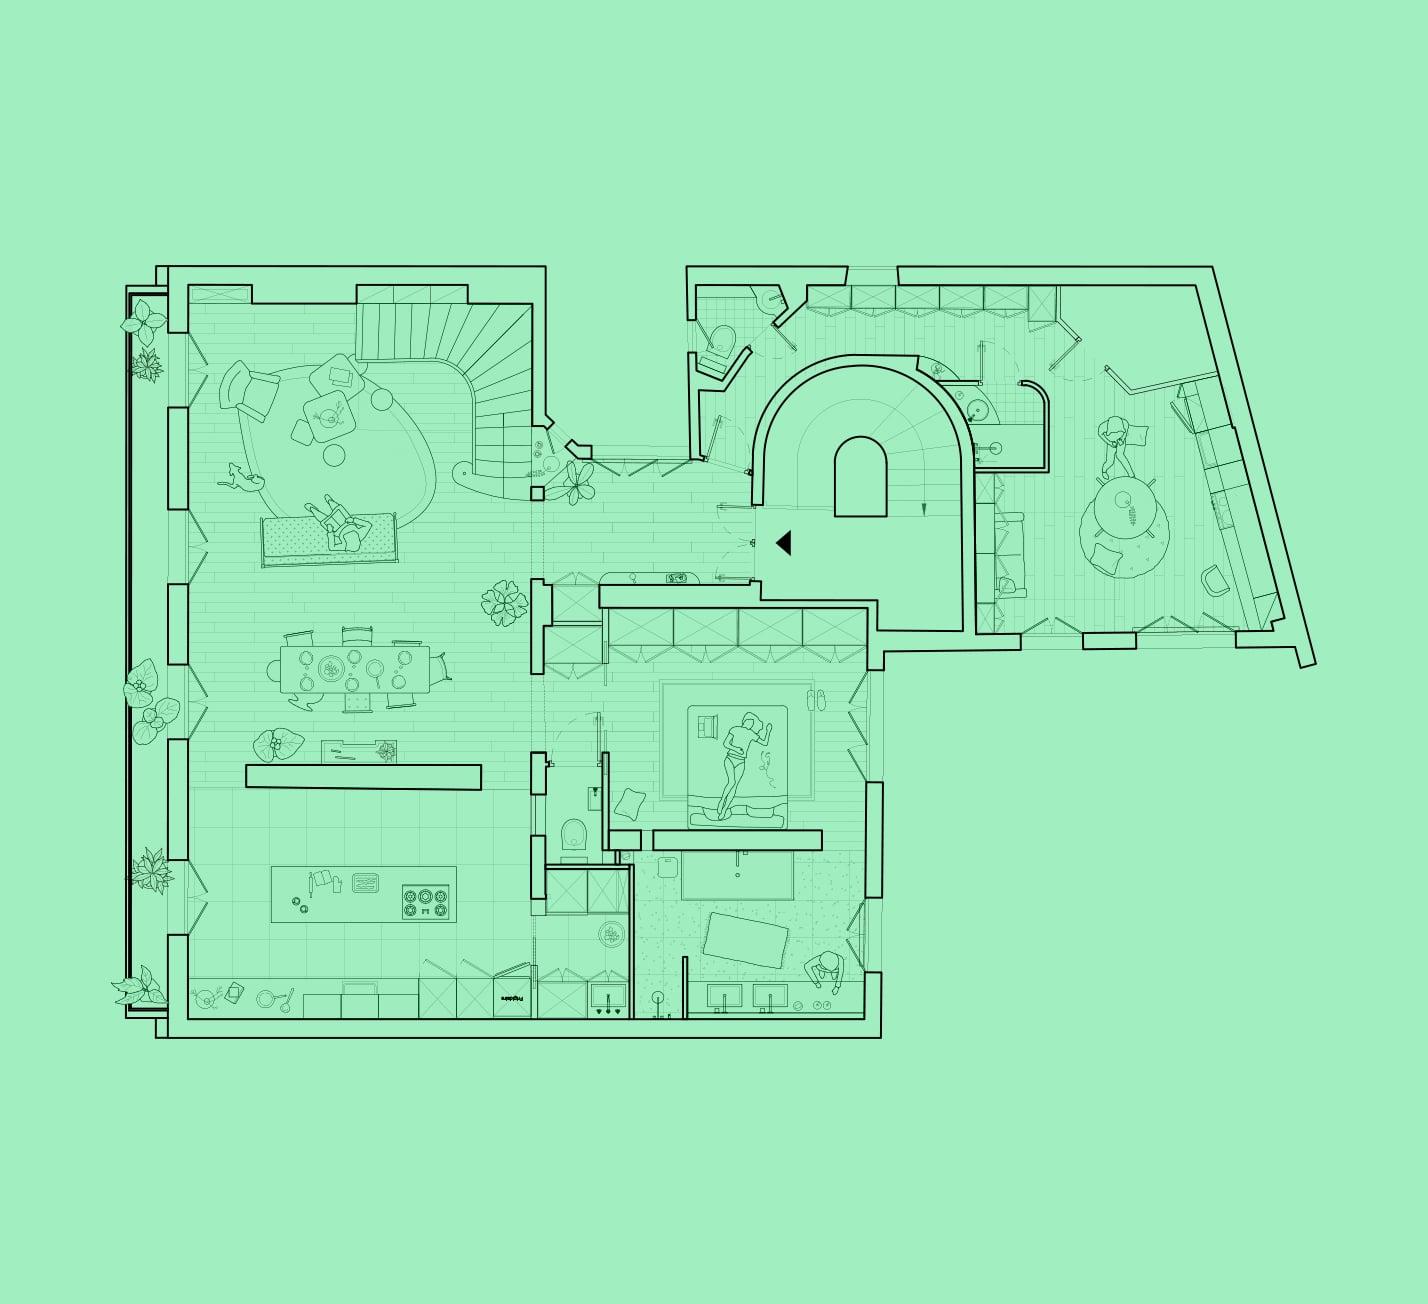 Projet-Arlequin-Atelier-Steve-Pauline-Borgia-Architecture-Plan-01-min